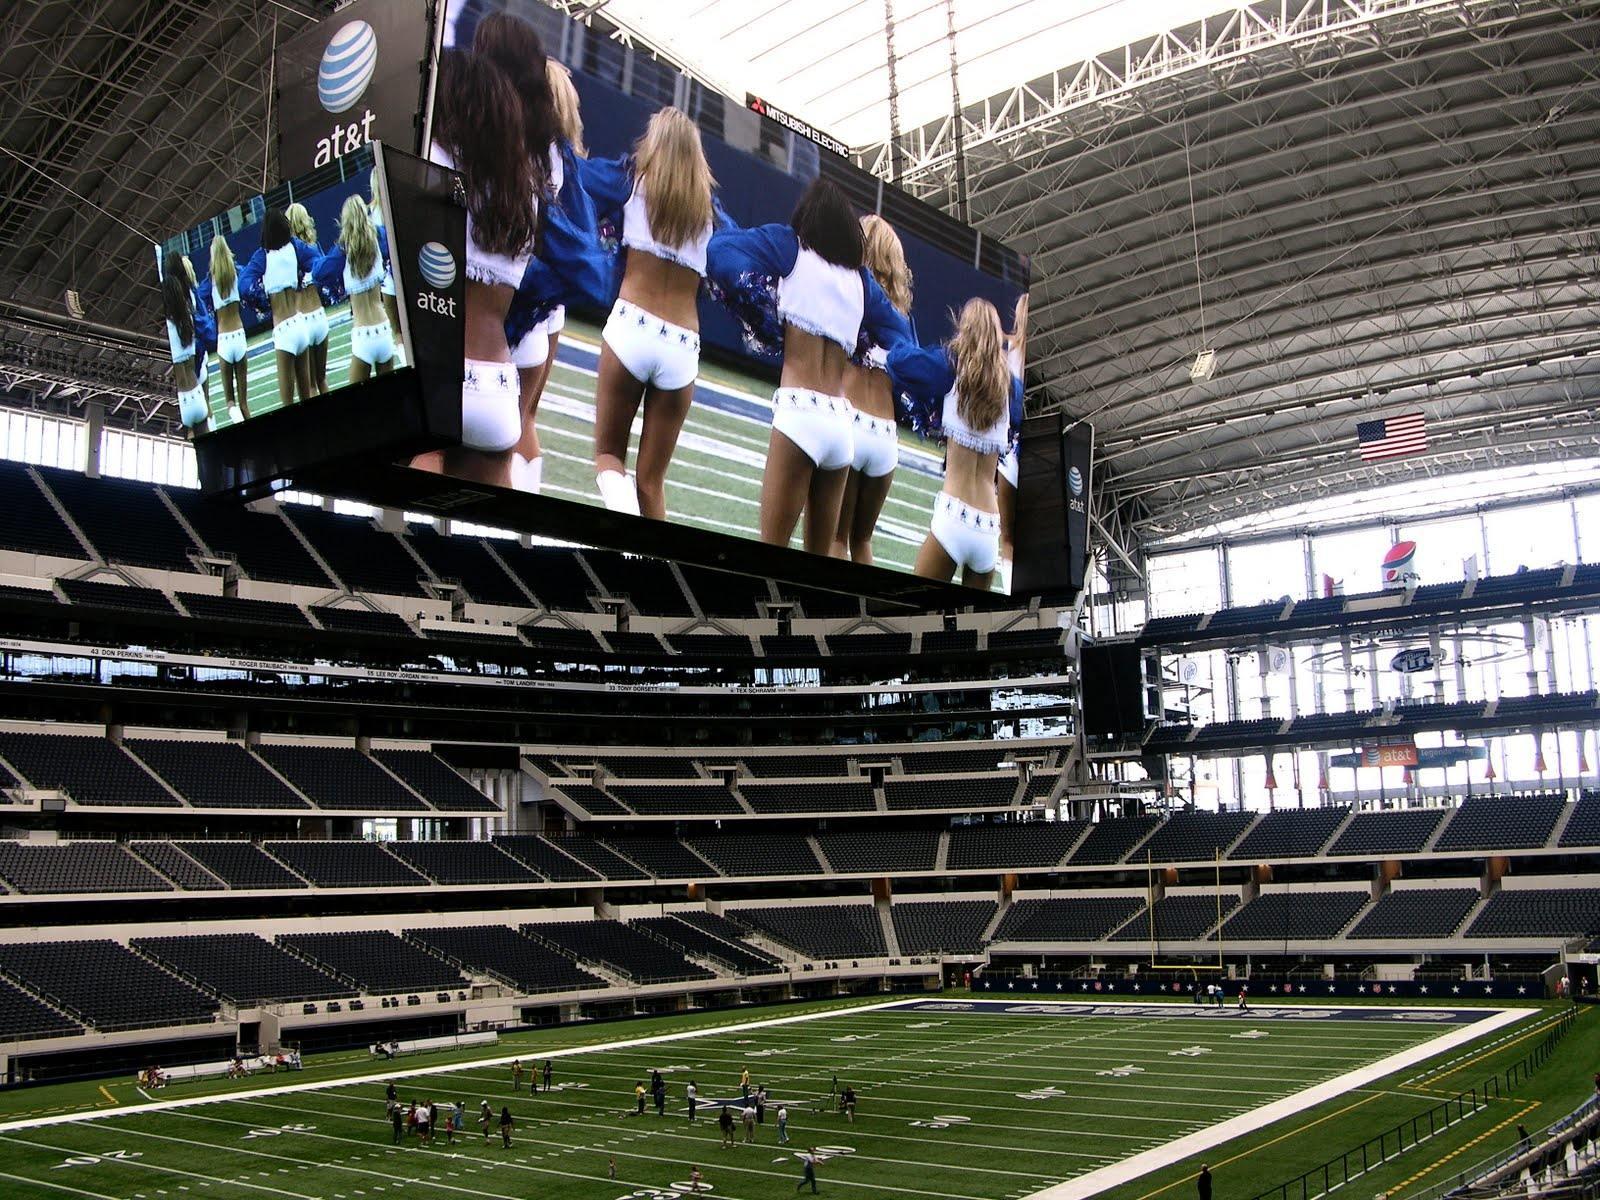 Cowboys Blog - AT&T Stadium, a visitor's vacation haven